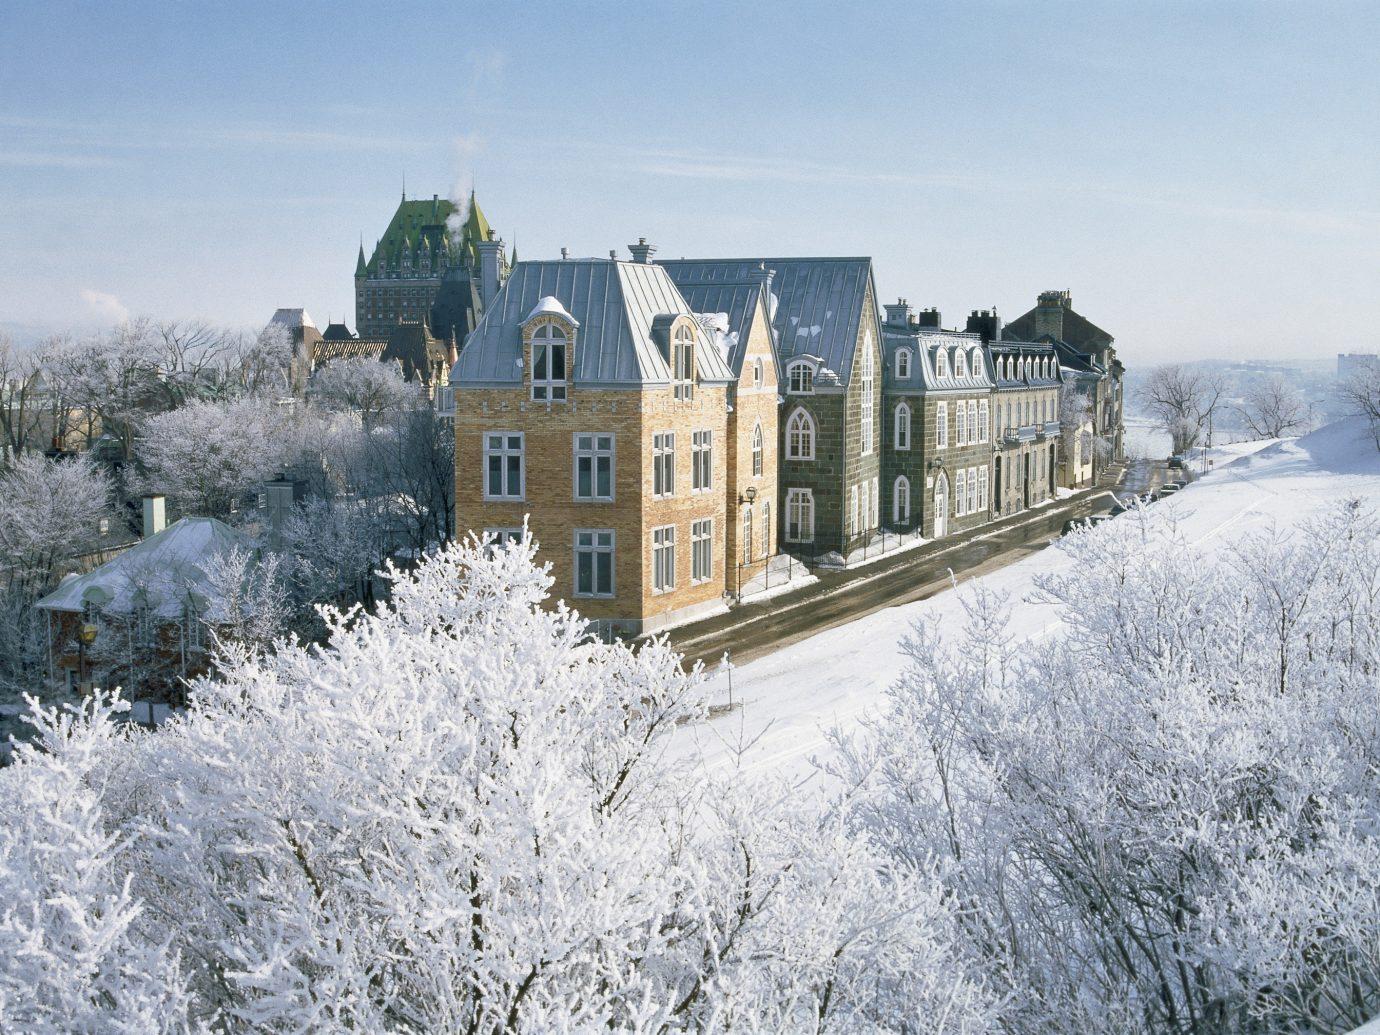 Boutique Hotels Romance Trip Ideas sky outdoor snow Winter frost freezing building tree ice home estate château house tours castle day